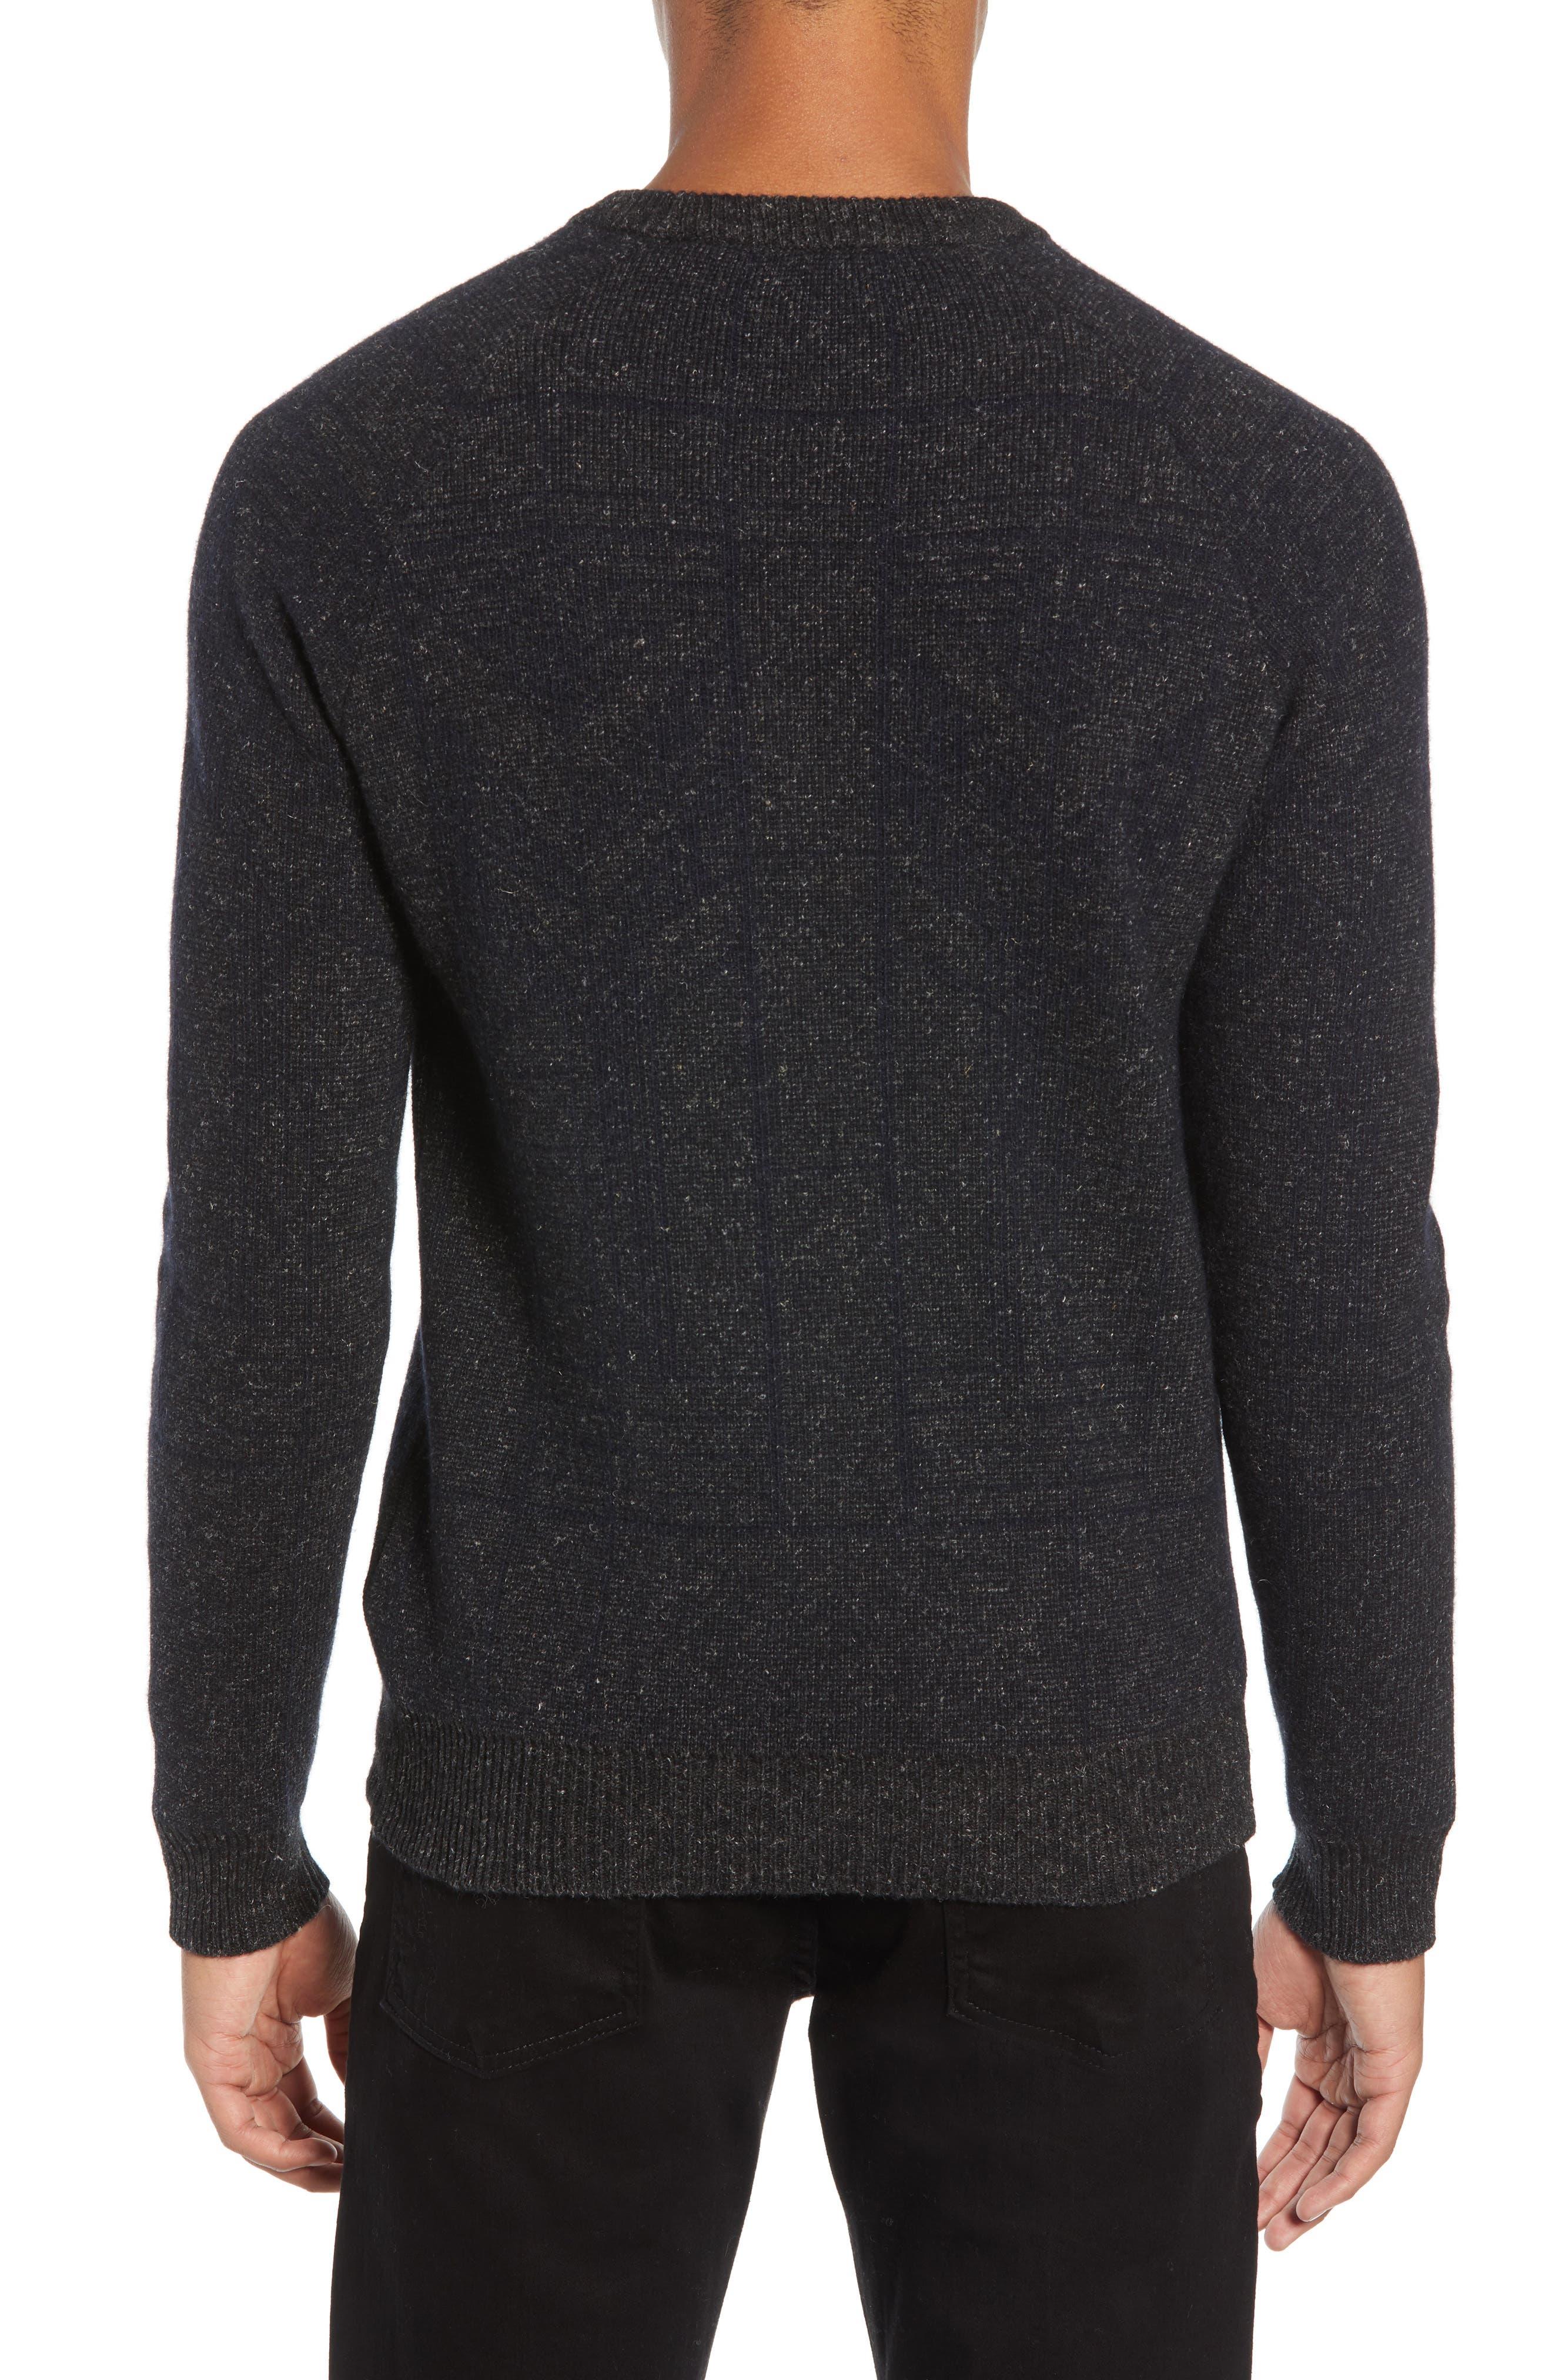 Regular Fit Crewneck Sweater,                             Alternate thumbnail 2, color,                             CHARCOAL